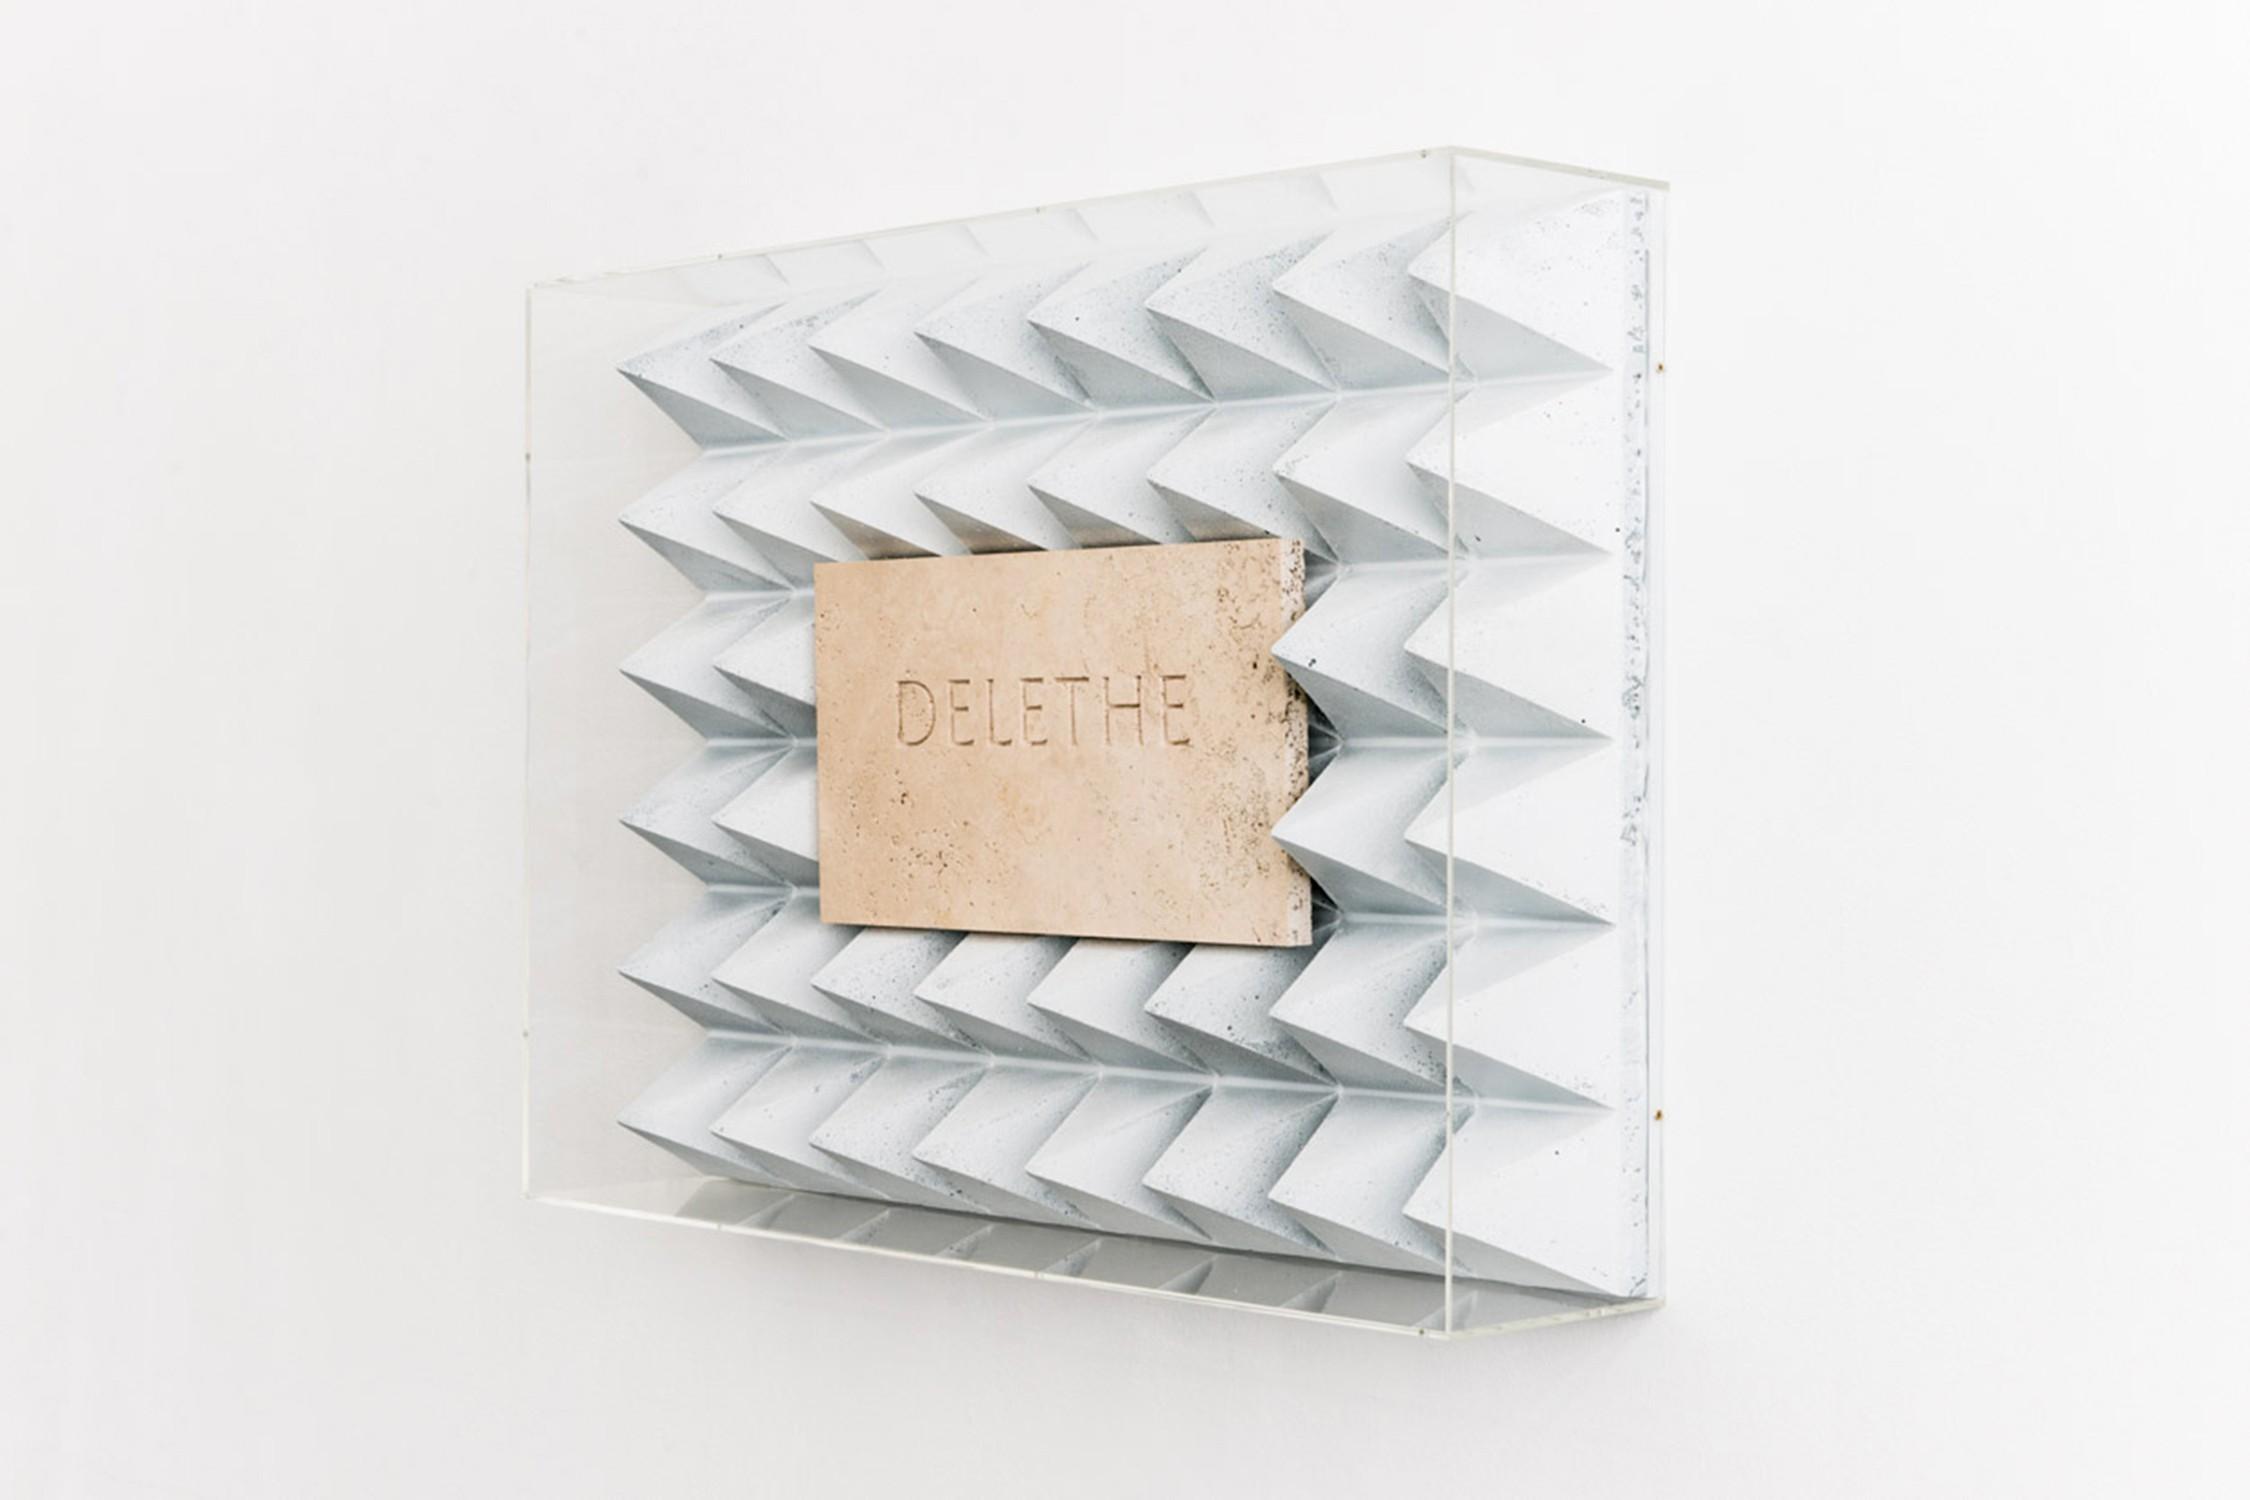 DELETHE (Edition)